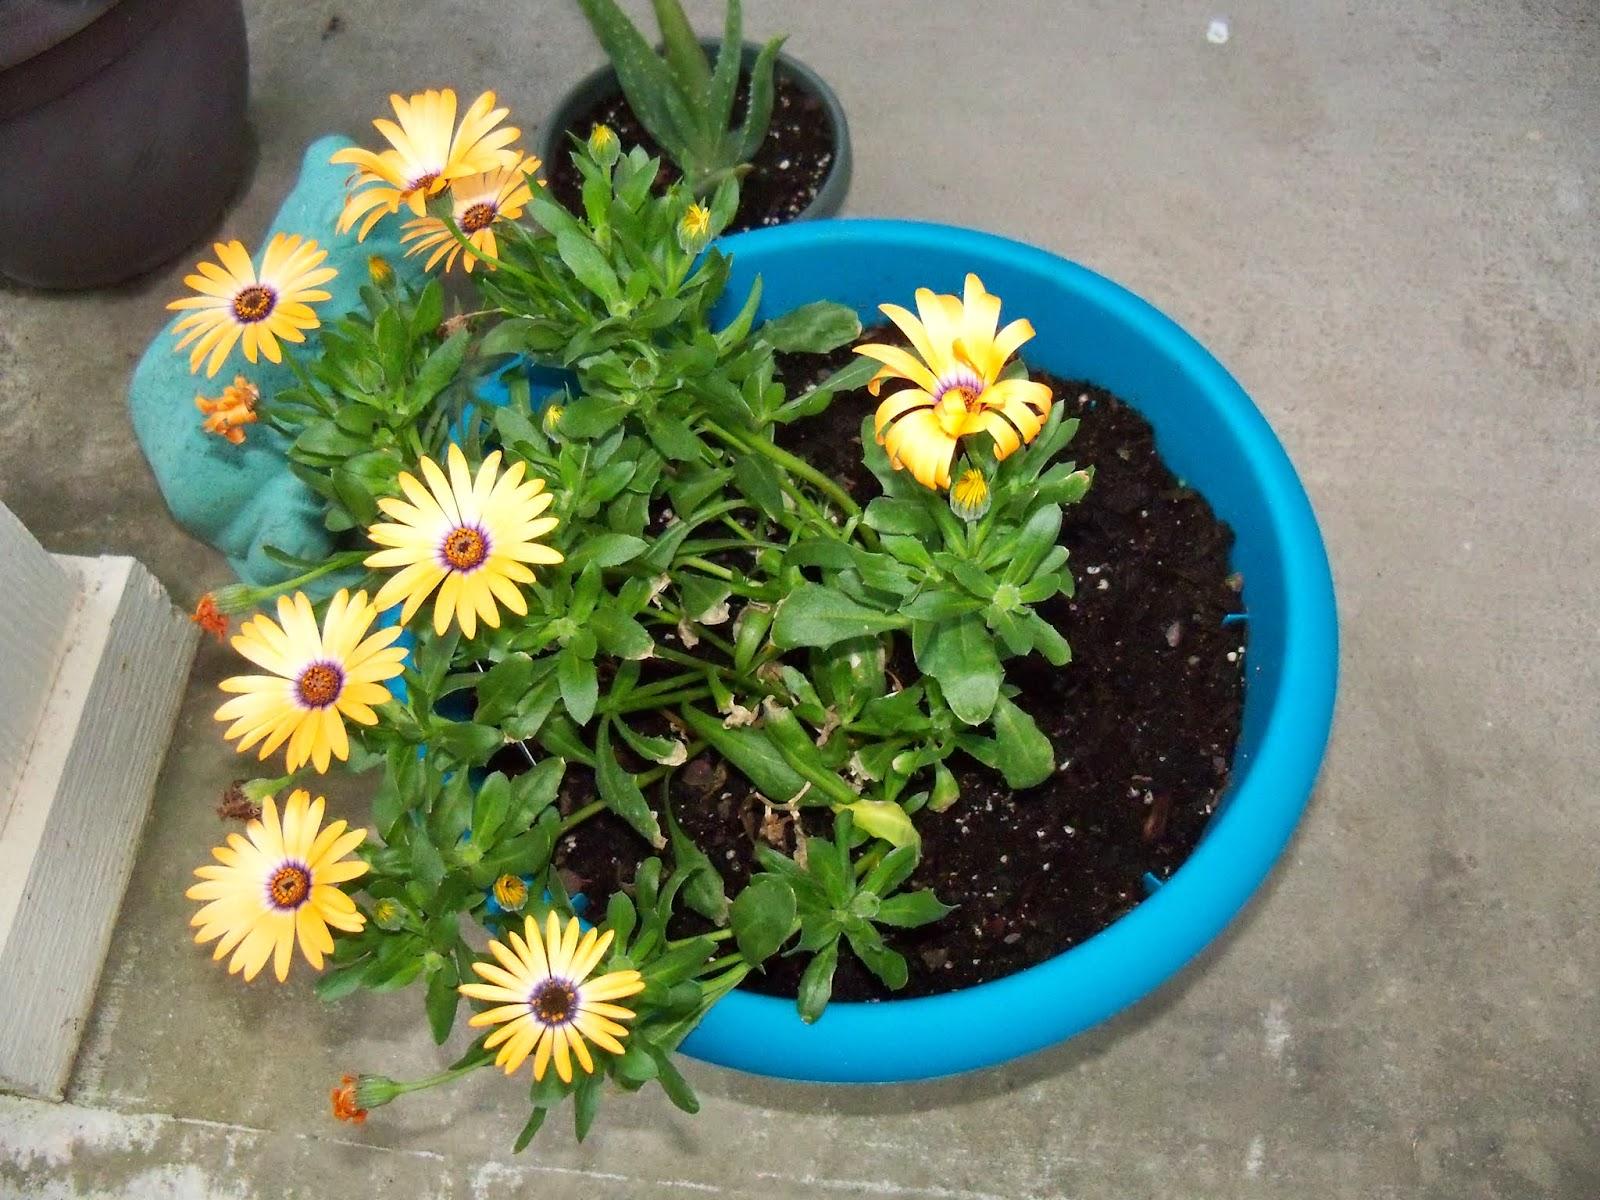 Gardening 2015 - 116_7625.JPG